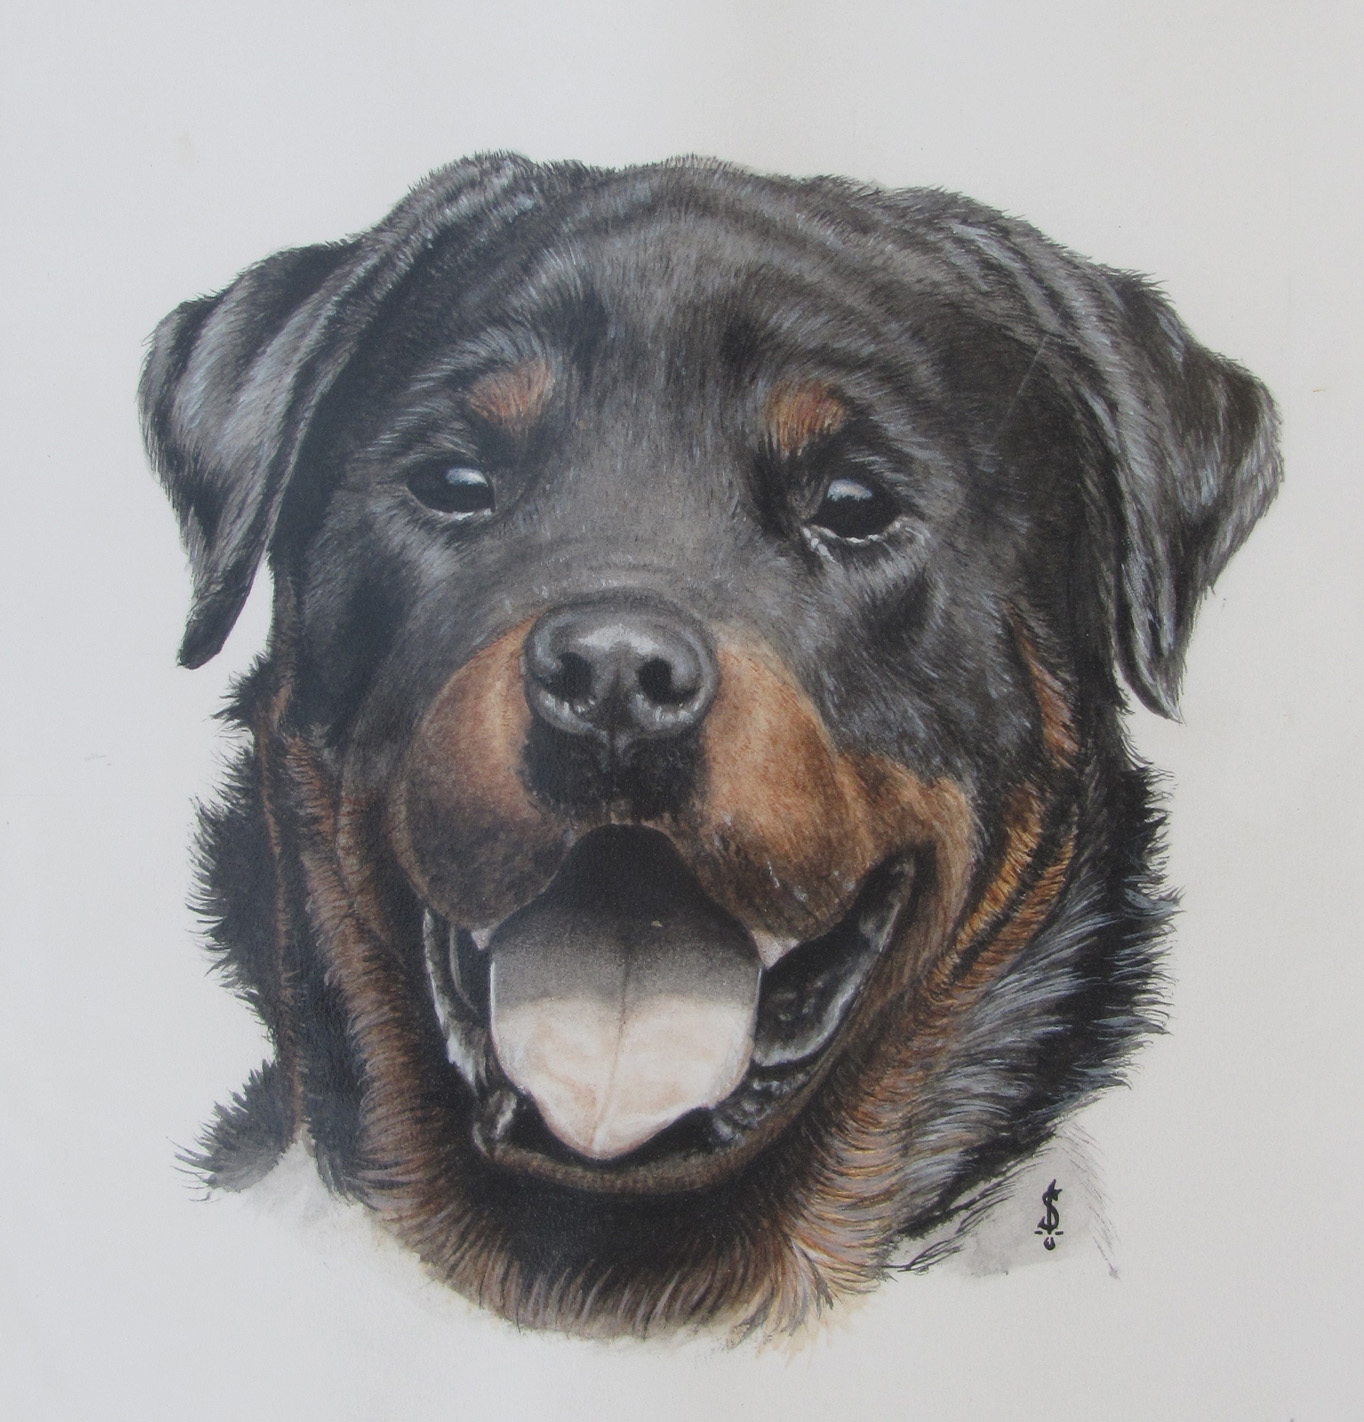 Rottweiler Wallpaper: Rottweiler By WampireW On DeviantArt